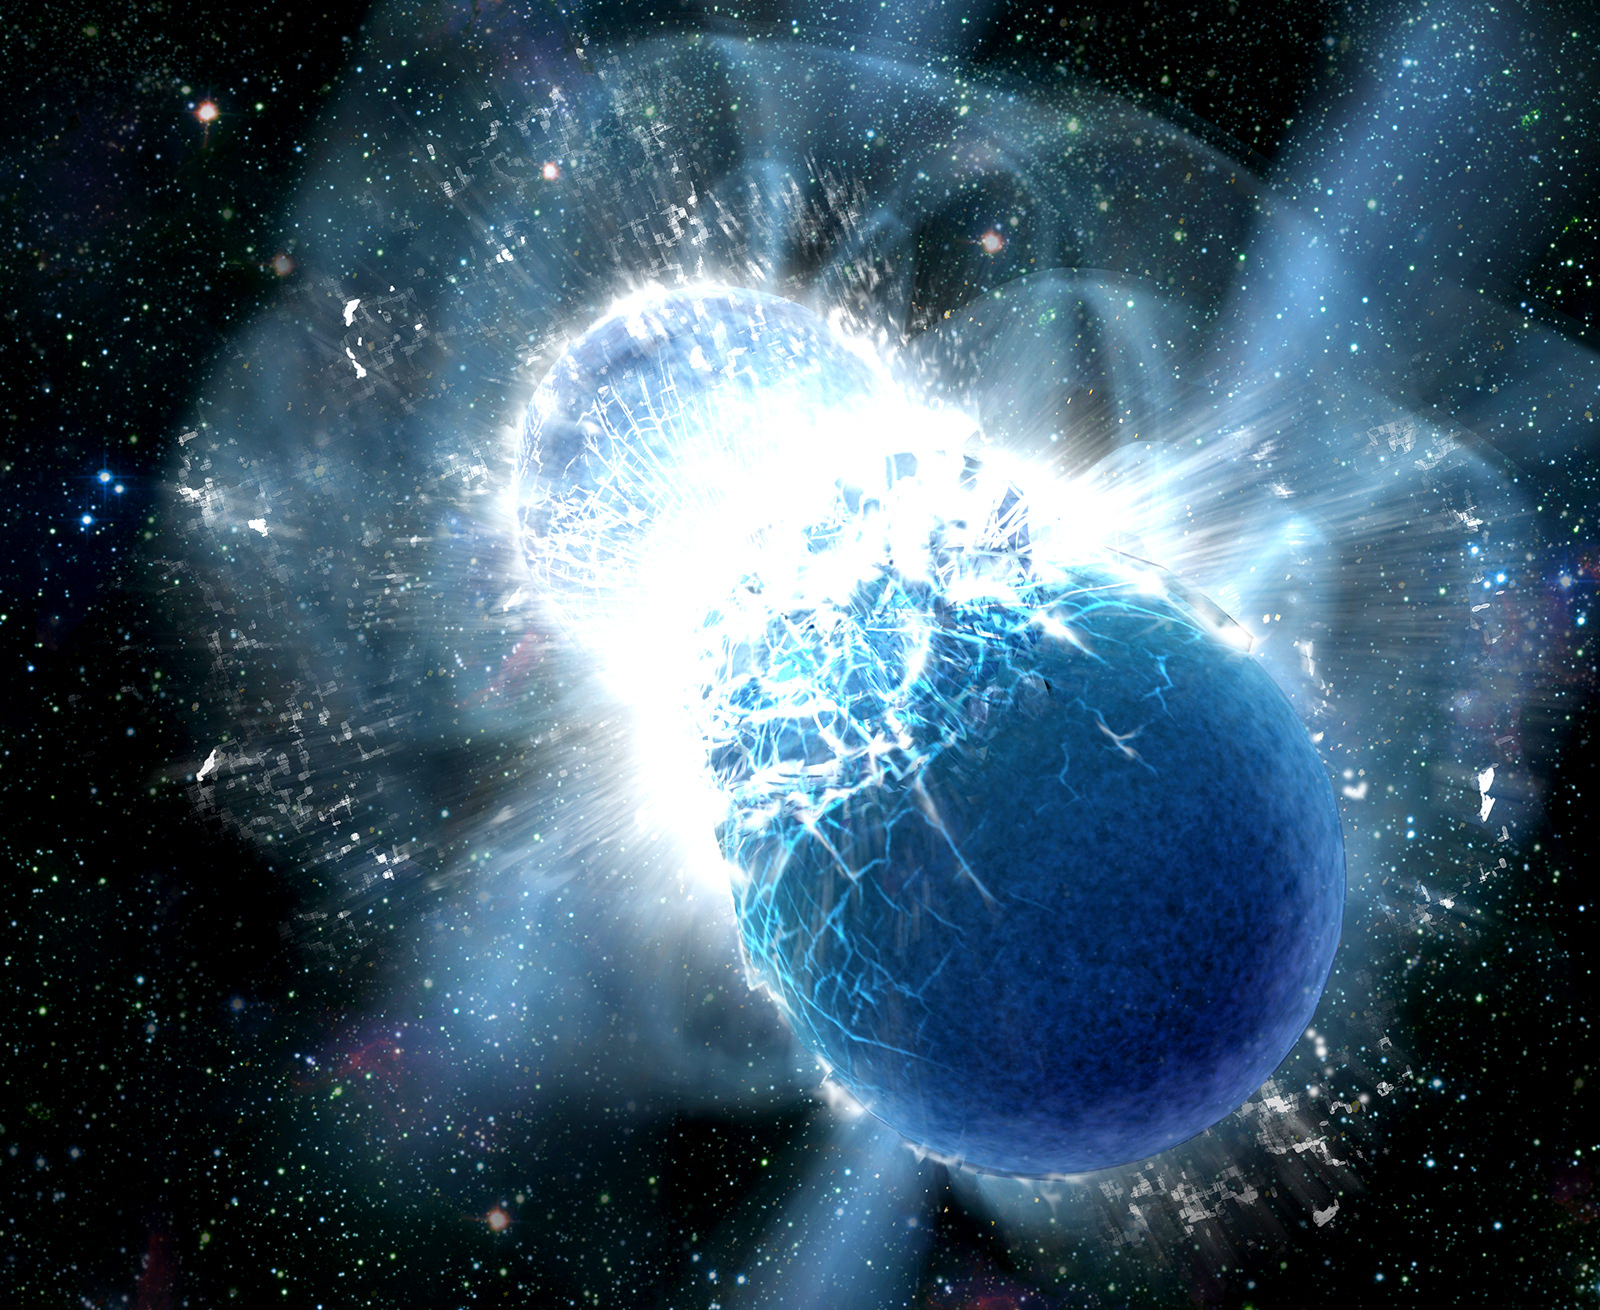 Collisions of neutron stars produce powerful gamma-ray bursts – and heavy elements like gold (Credit: Dana Berry, SkyWorks Digital, Inc.)